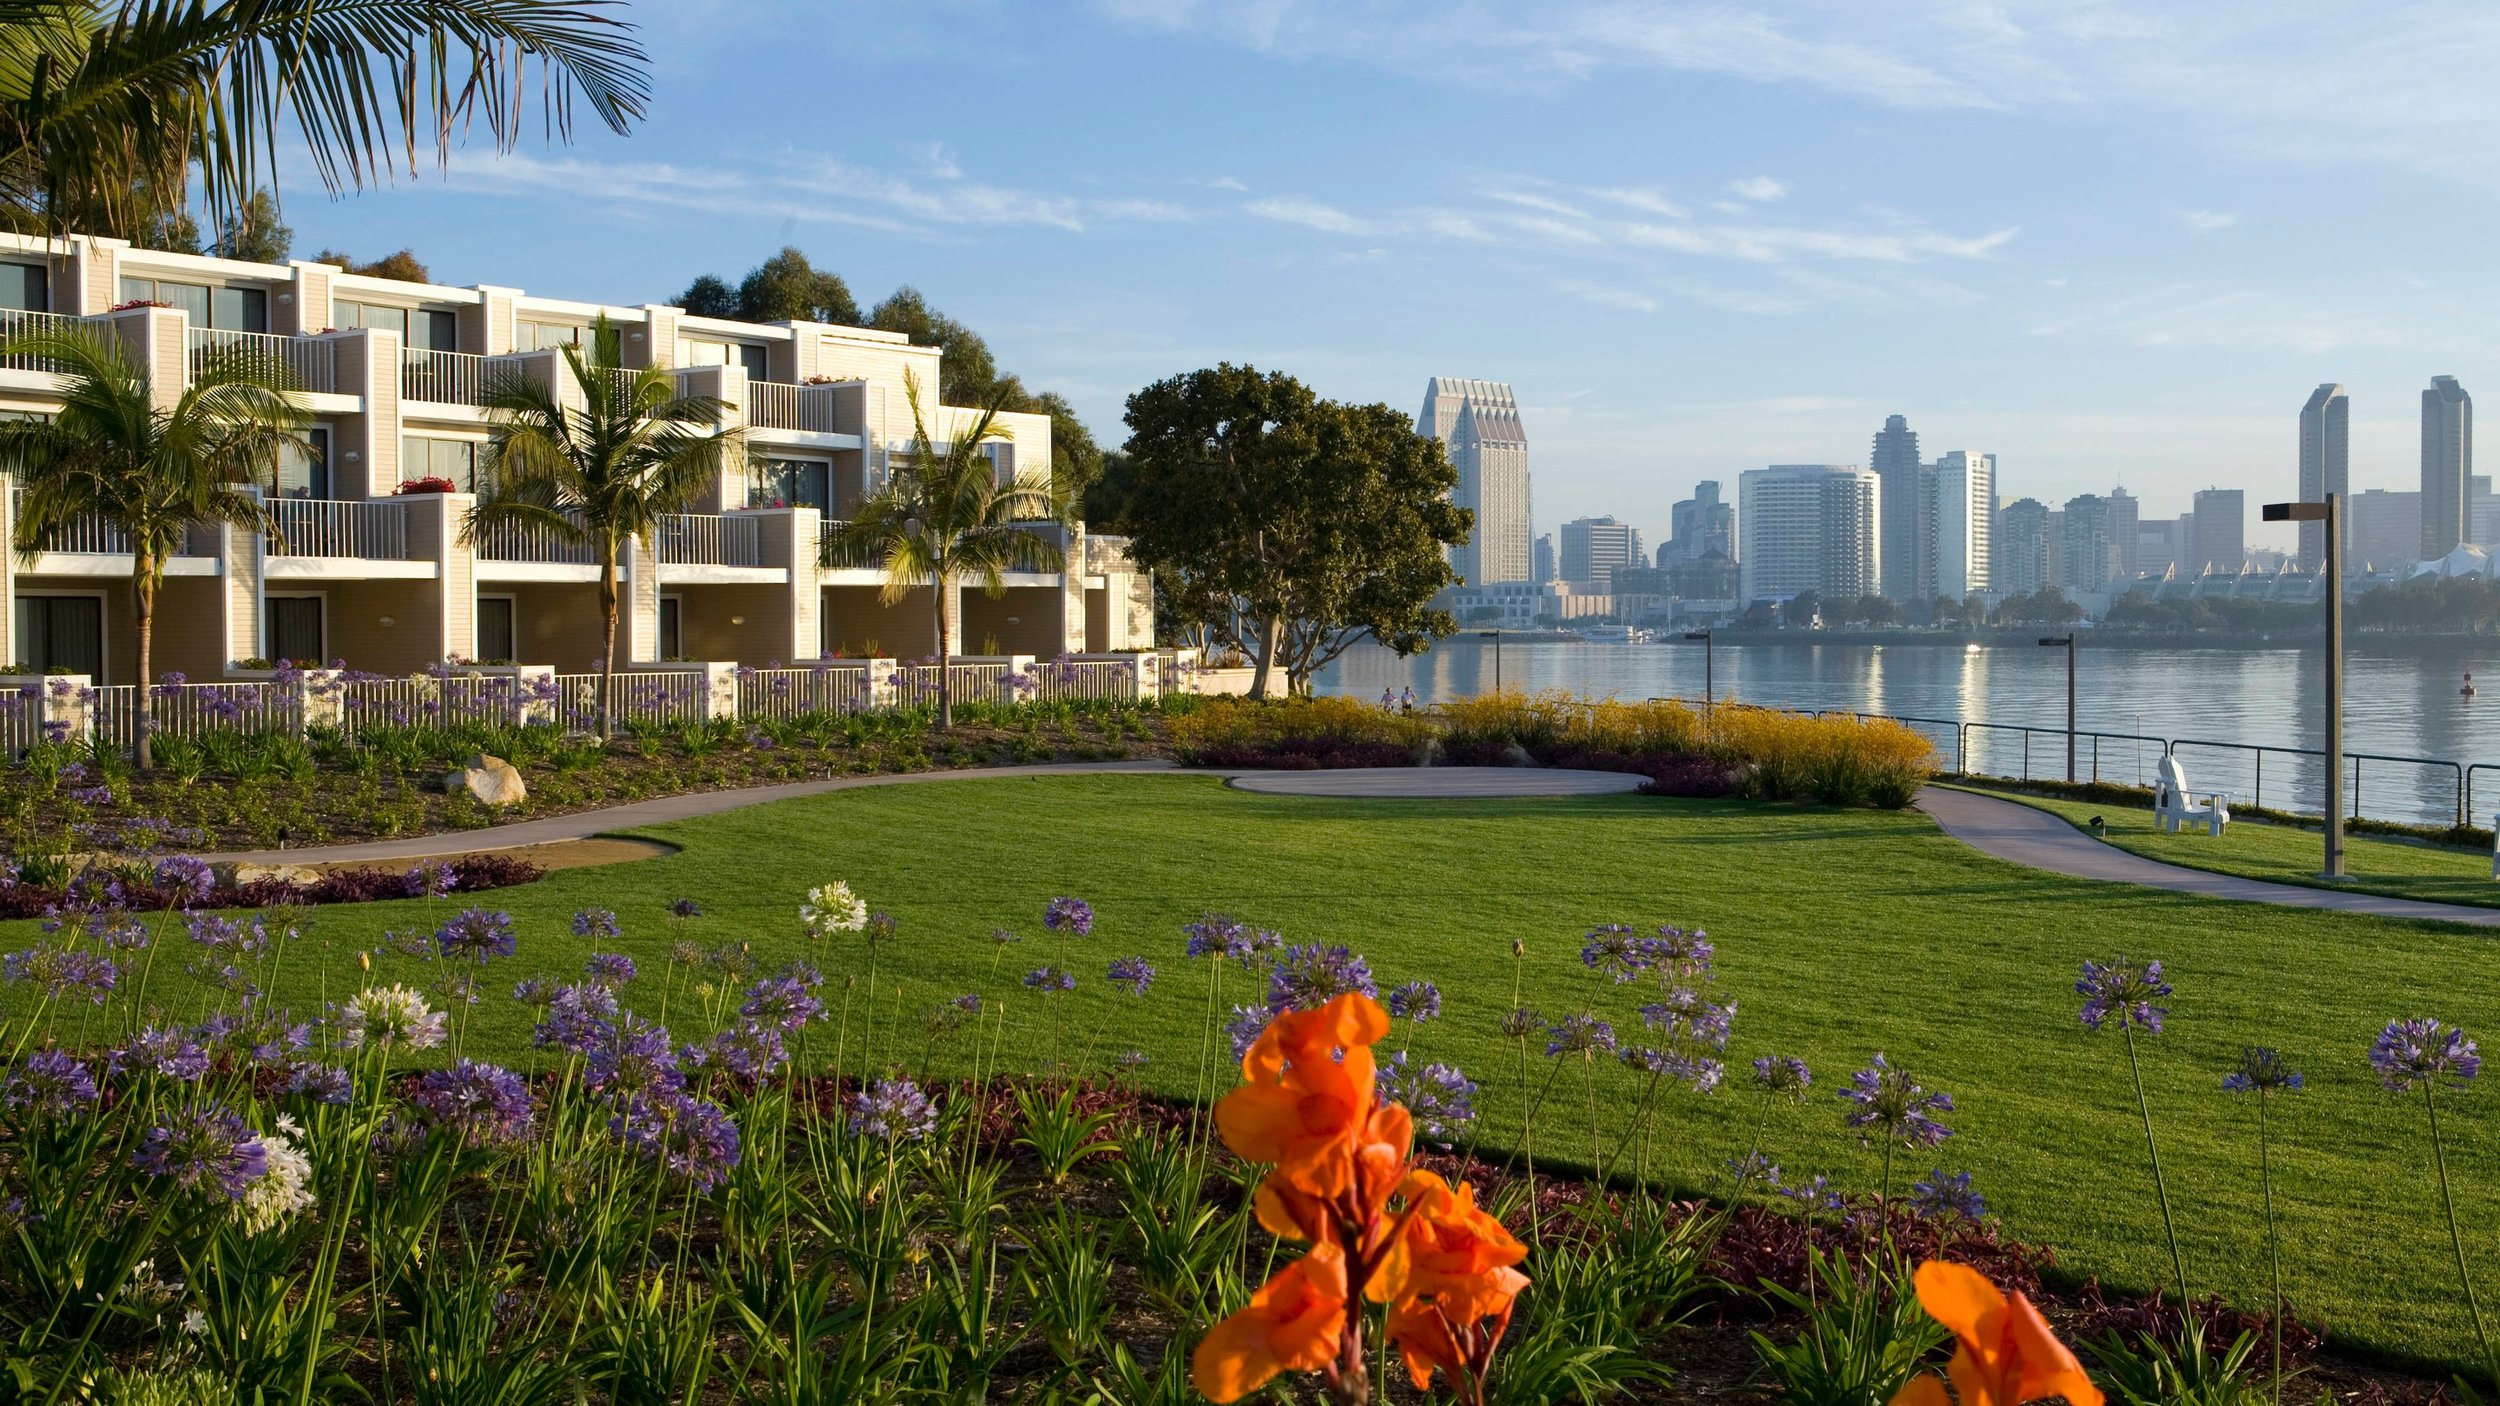 coronado island marriott resort & spa - Coronado Island Marriott Resort & Spa offers an idyllic retreat. With views of the San Diego skyline and Coronado Bridge, the hotel is ideally situated to provide easy access to Coronado Beach and San Diego attractions.